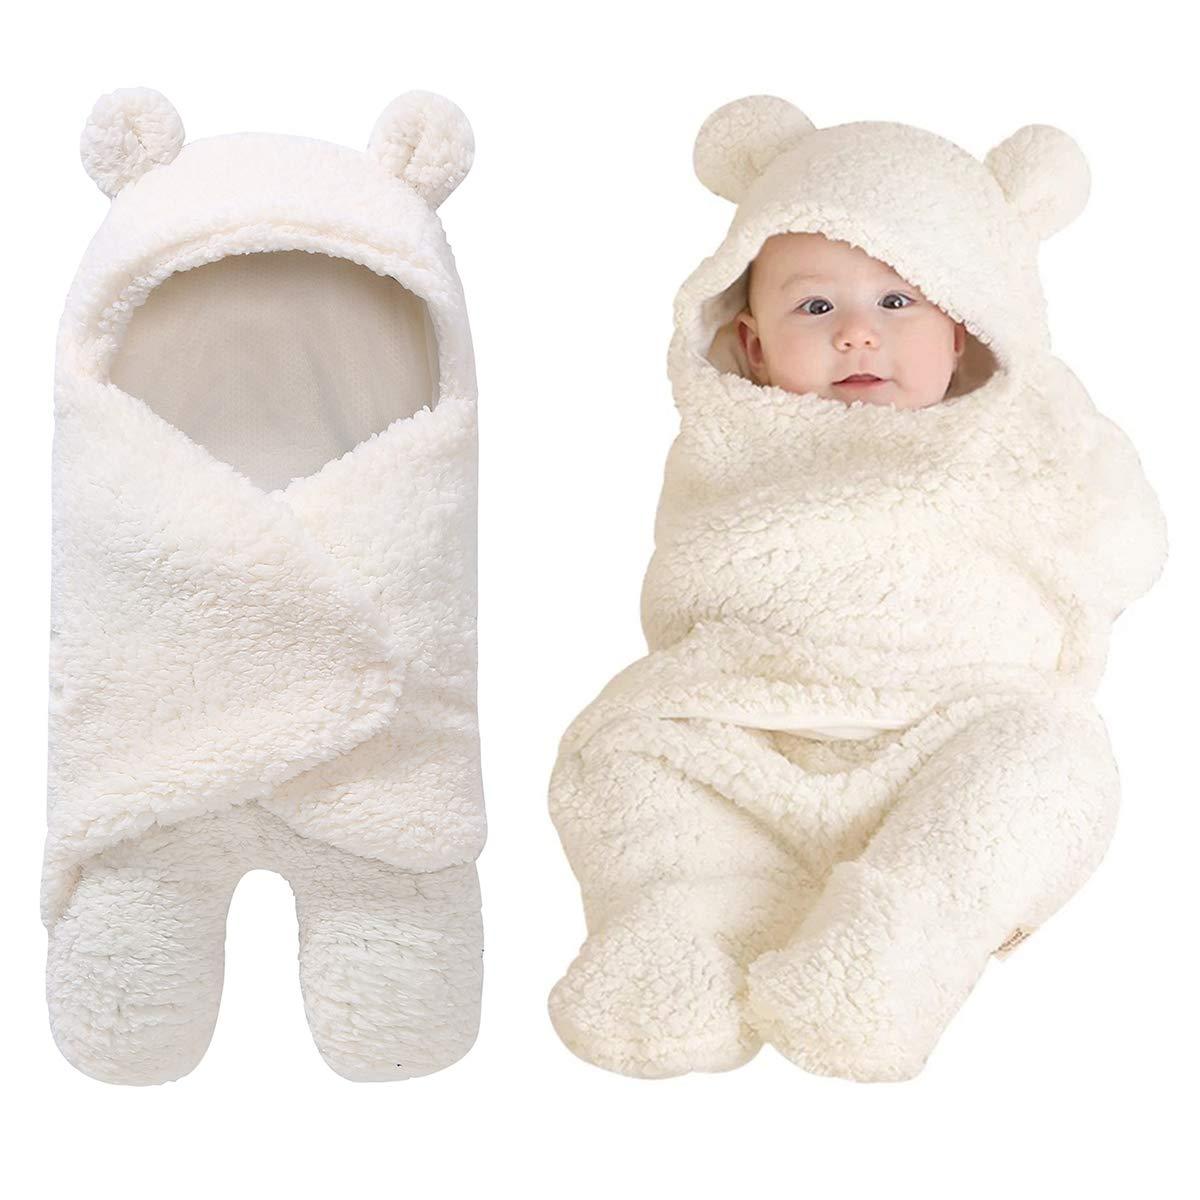 Baby Receiving Blanket, Hooded Cotton Plush Swaddle Blanket, Newborn Cute Sleeping Bag Sack Unisex Stroller Wrap for Baby Boys and Girls (Kahki) oenbopo